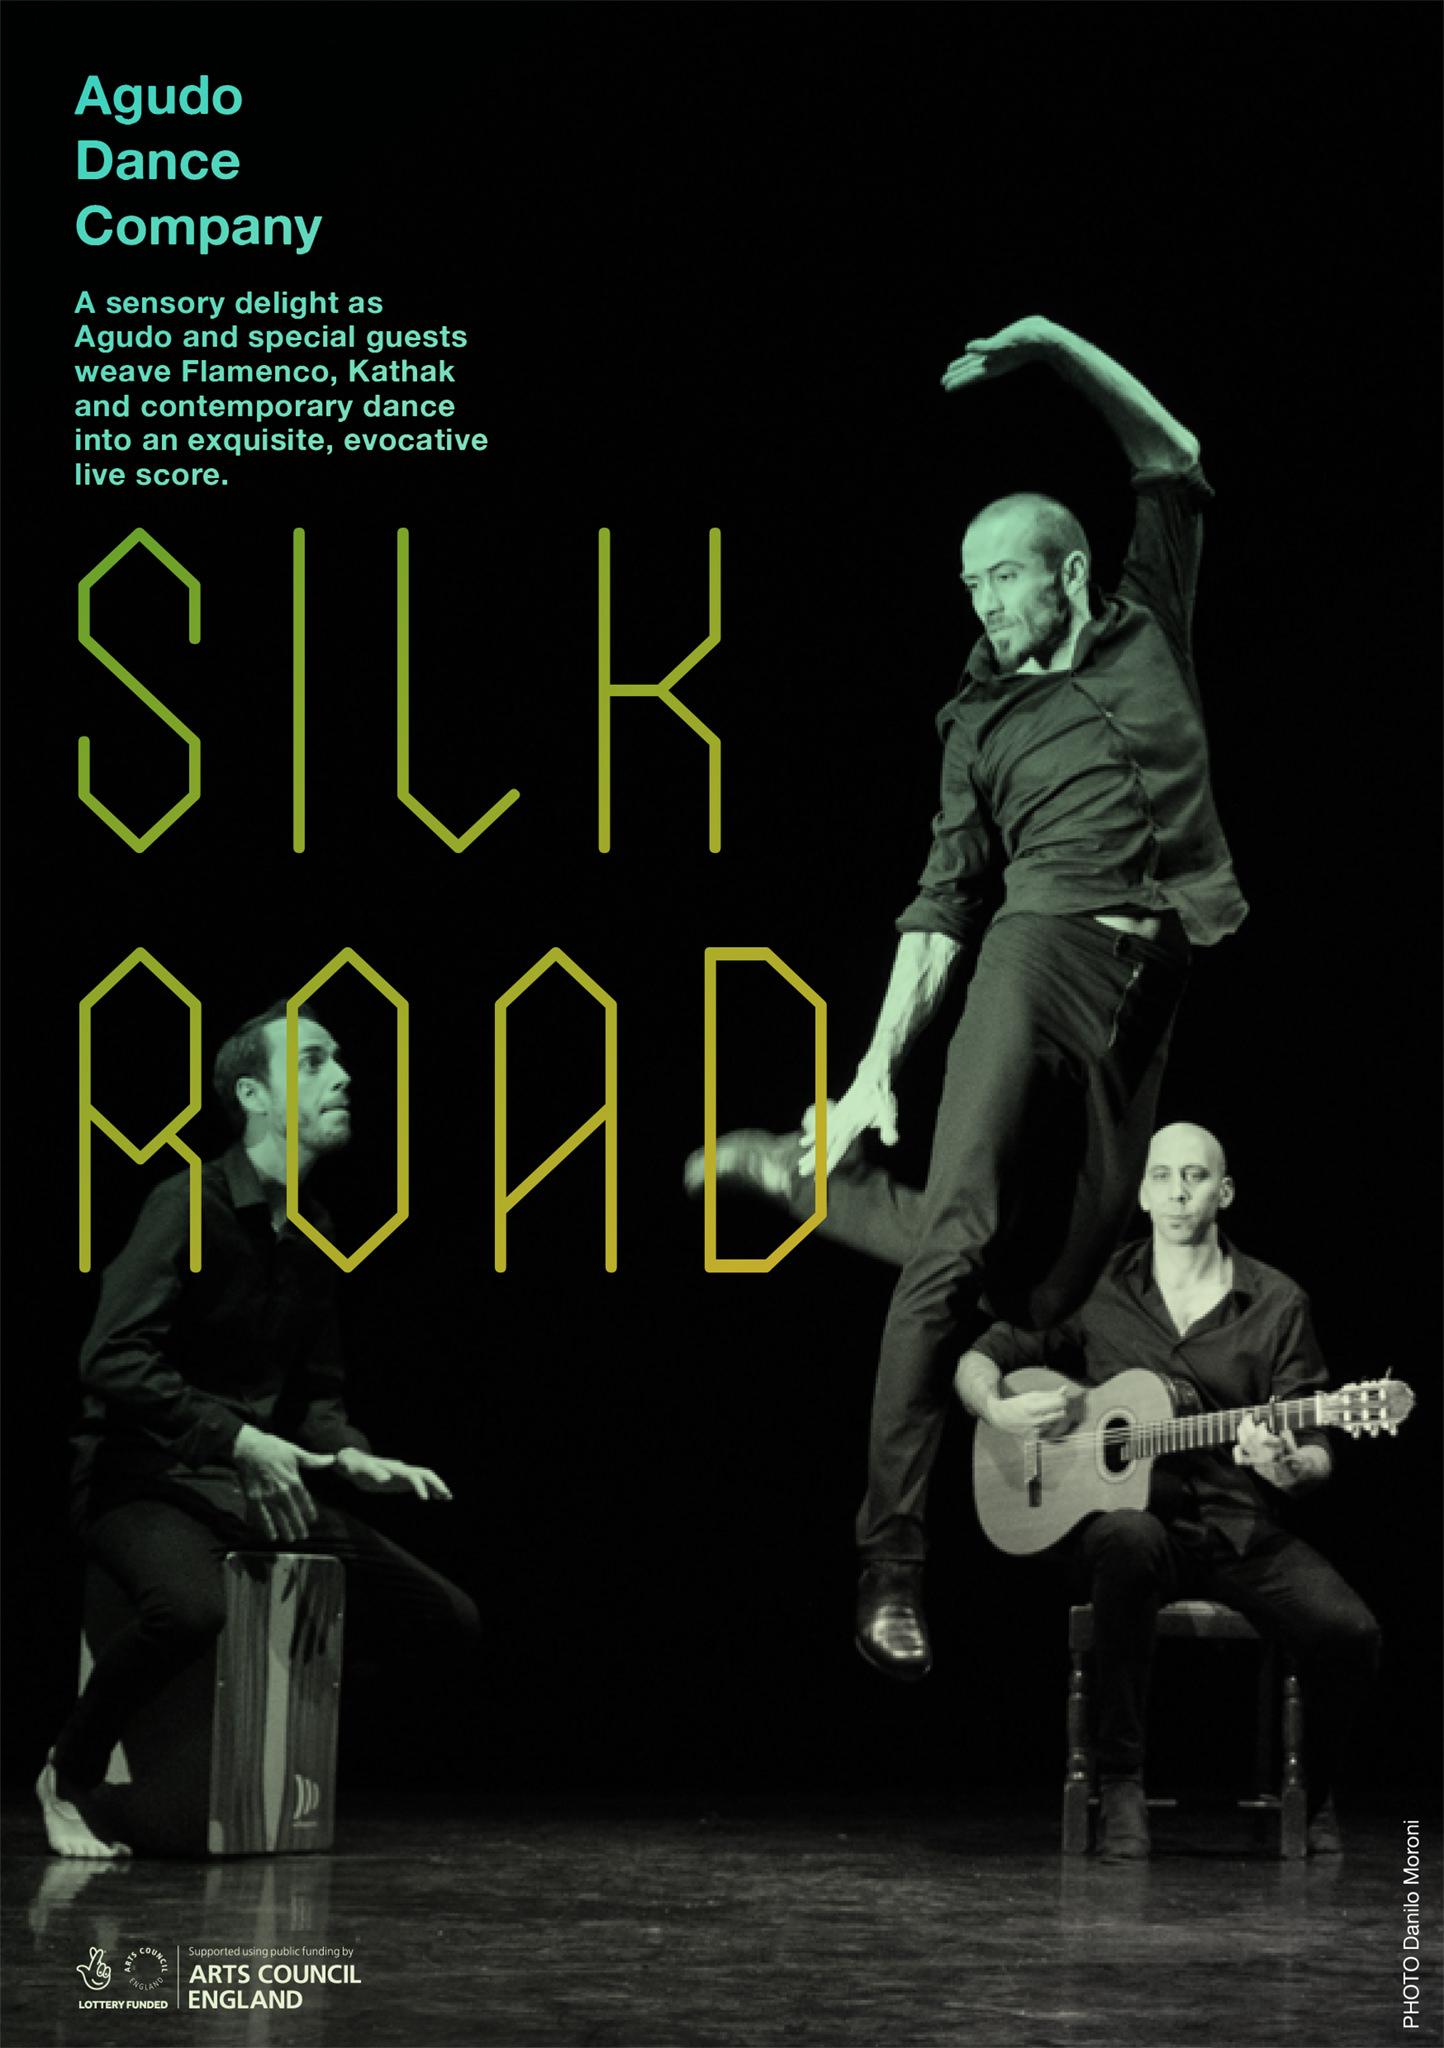 Jose_Agudo_Dance_Company_Silk-RoadSwwetshop_Revolution_Edinburgh_Fringe_I_Love_You_and_I_loved_You_photo_Danilo_Moroni.jpg